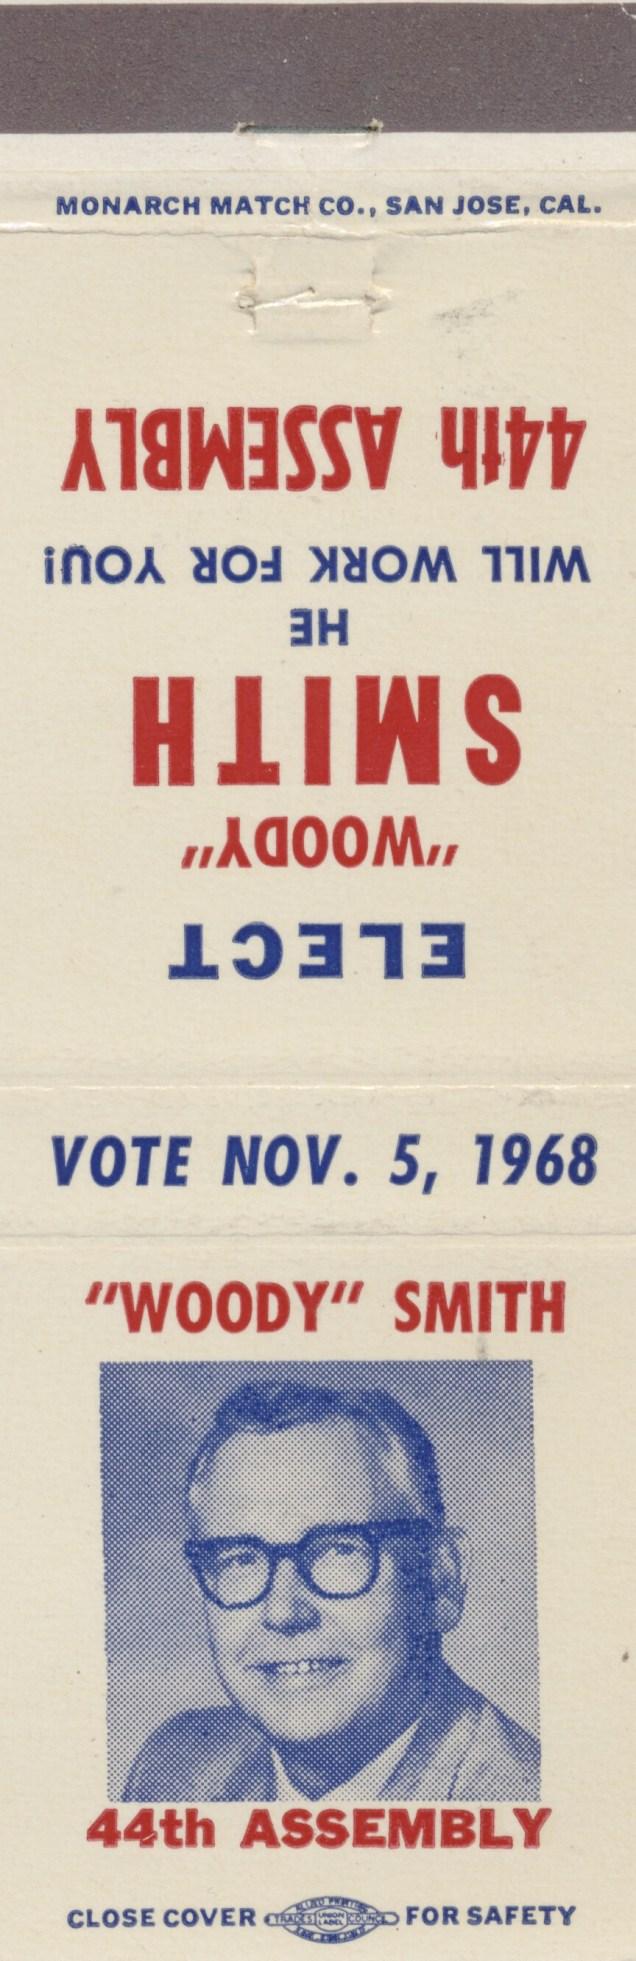 woody-smith-1